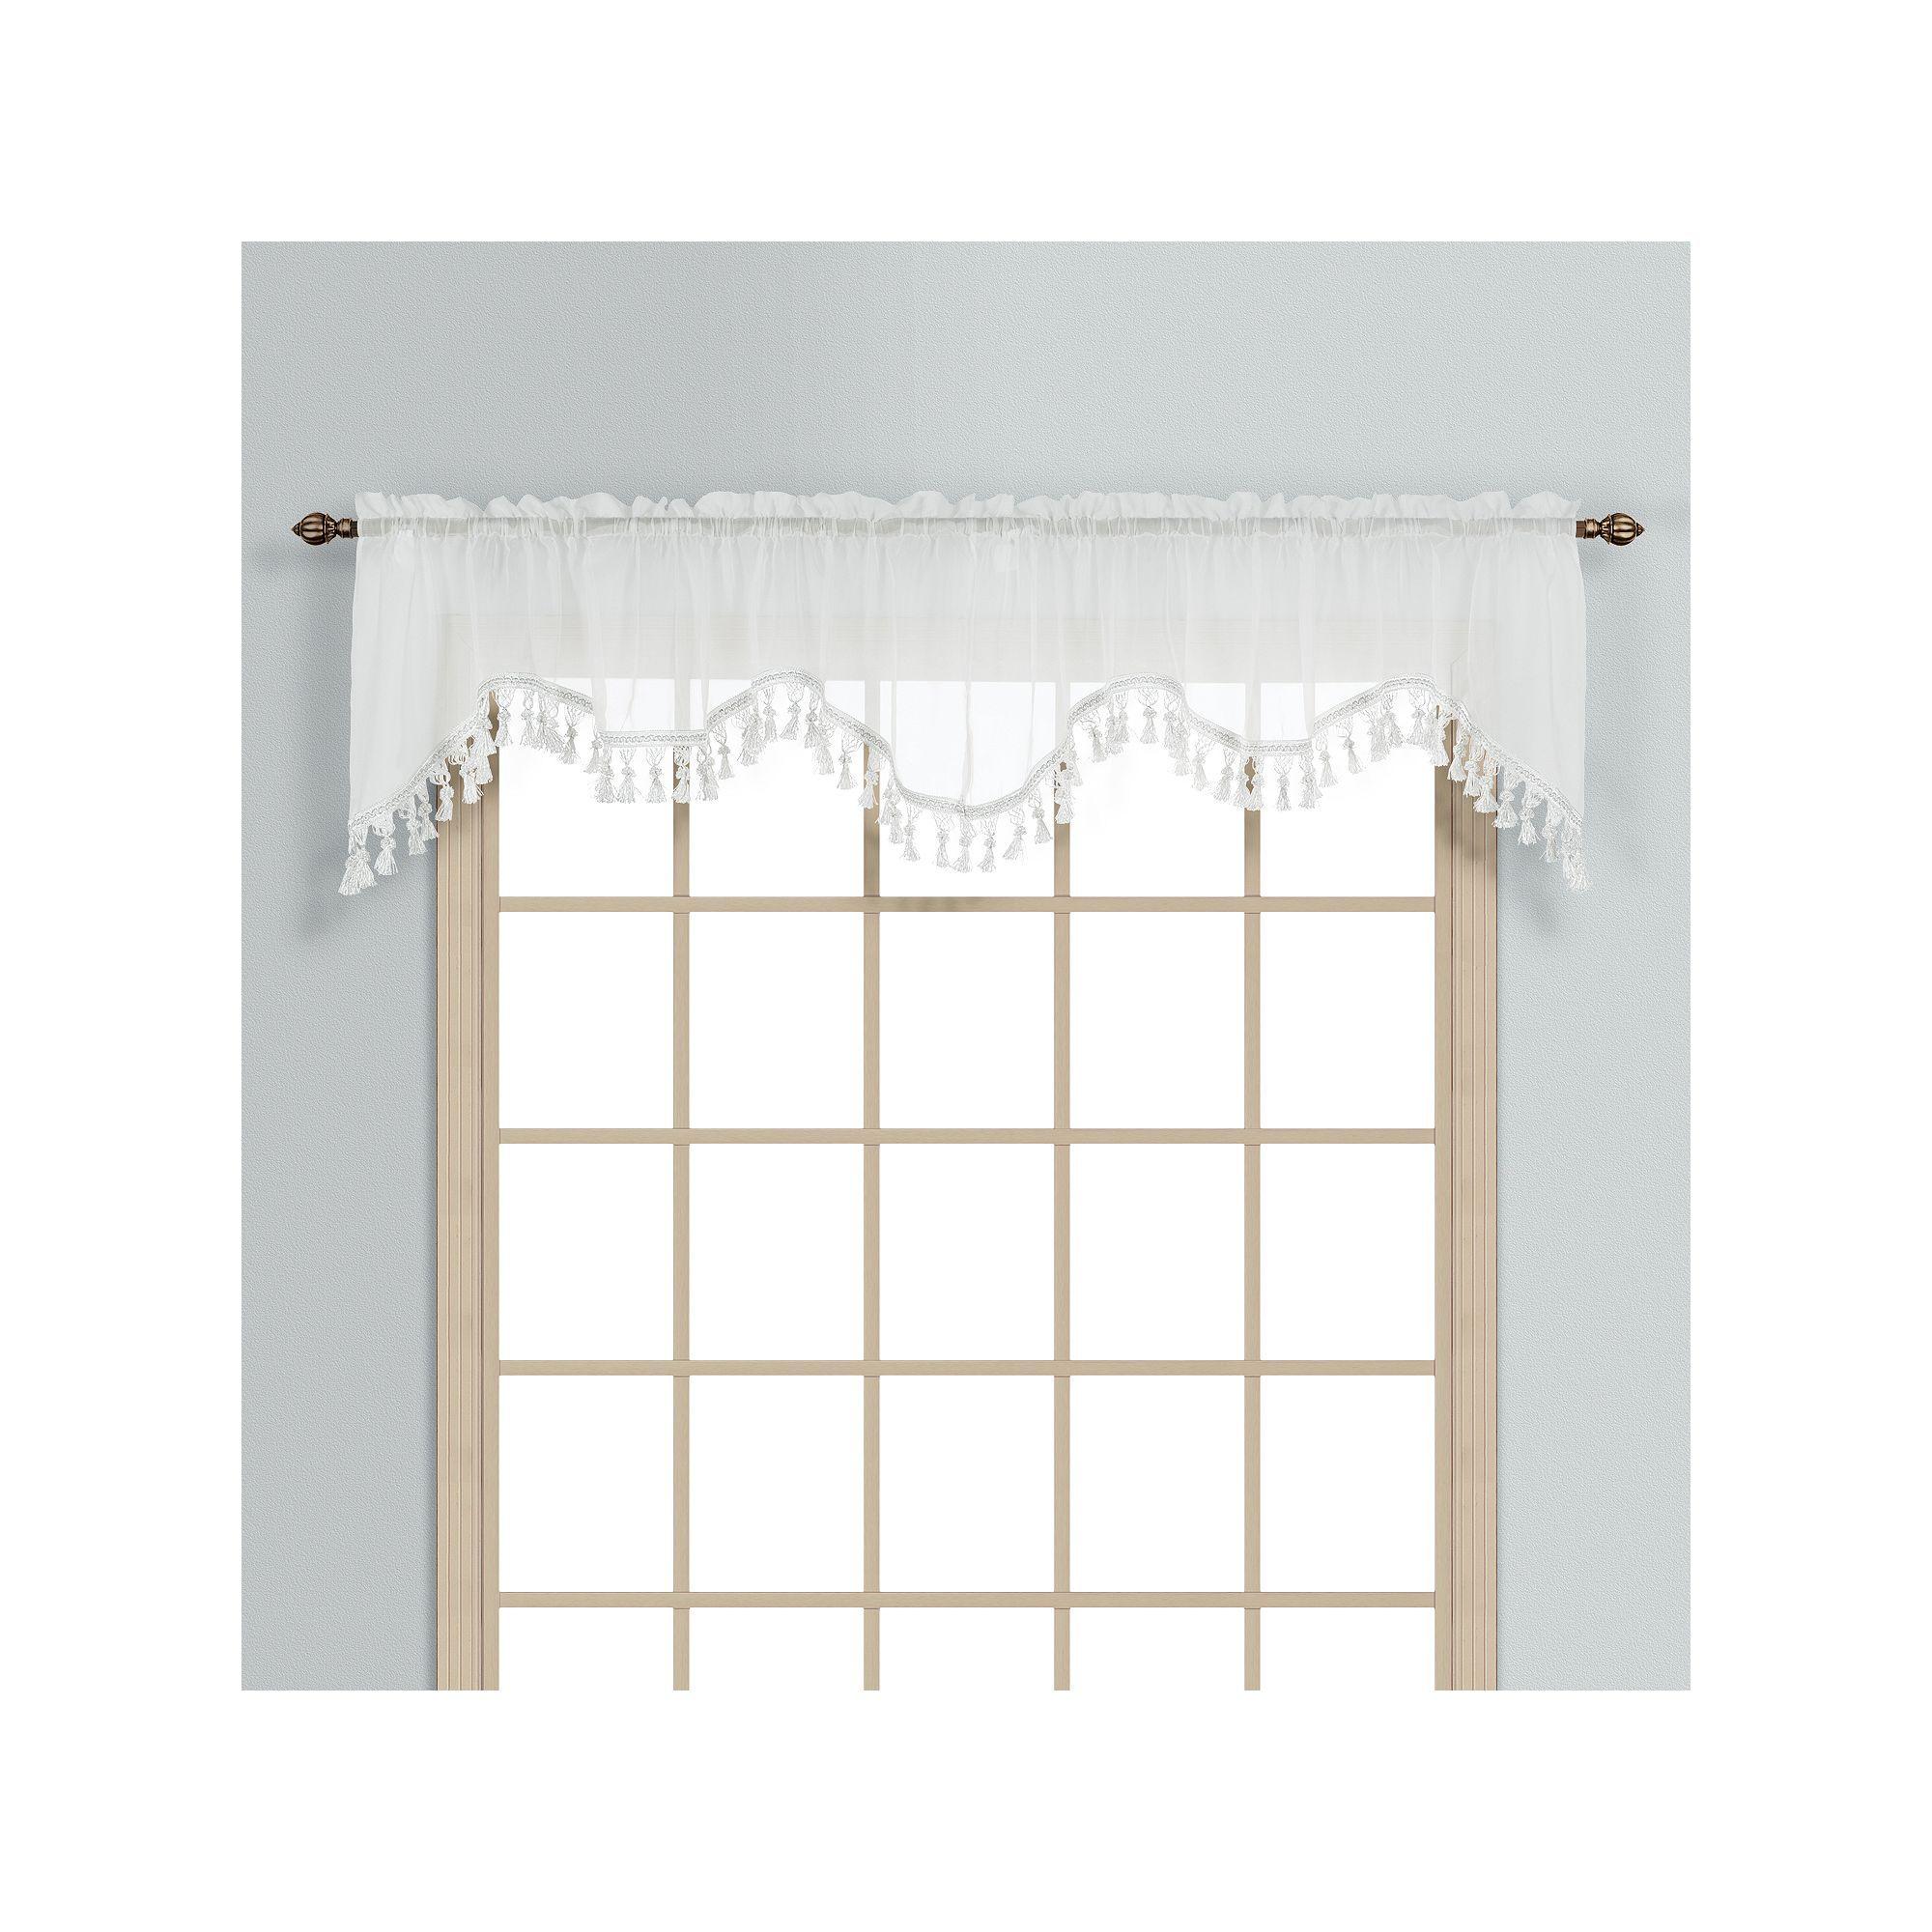 United Curtain Co. Monte Carlo Scalloped Valance - 59'' x 18'', White